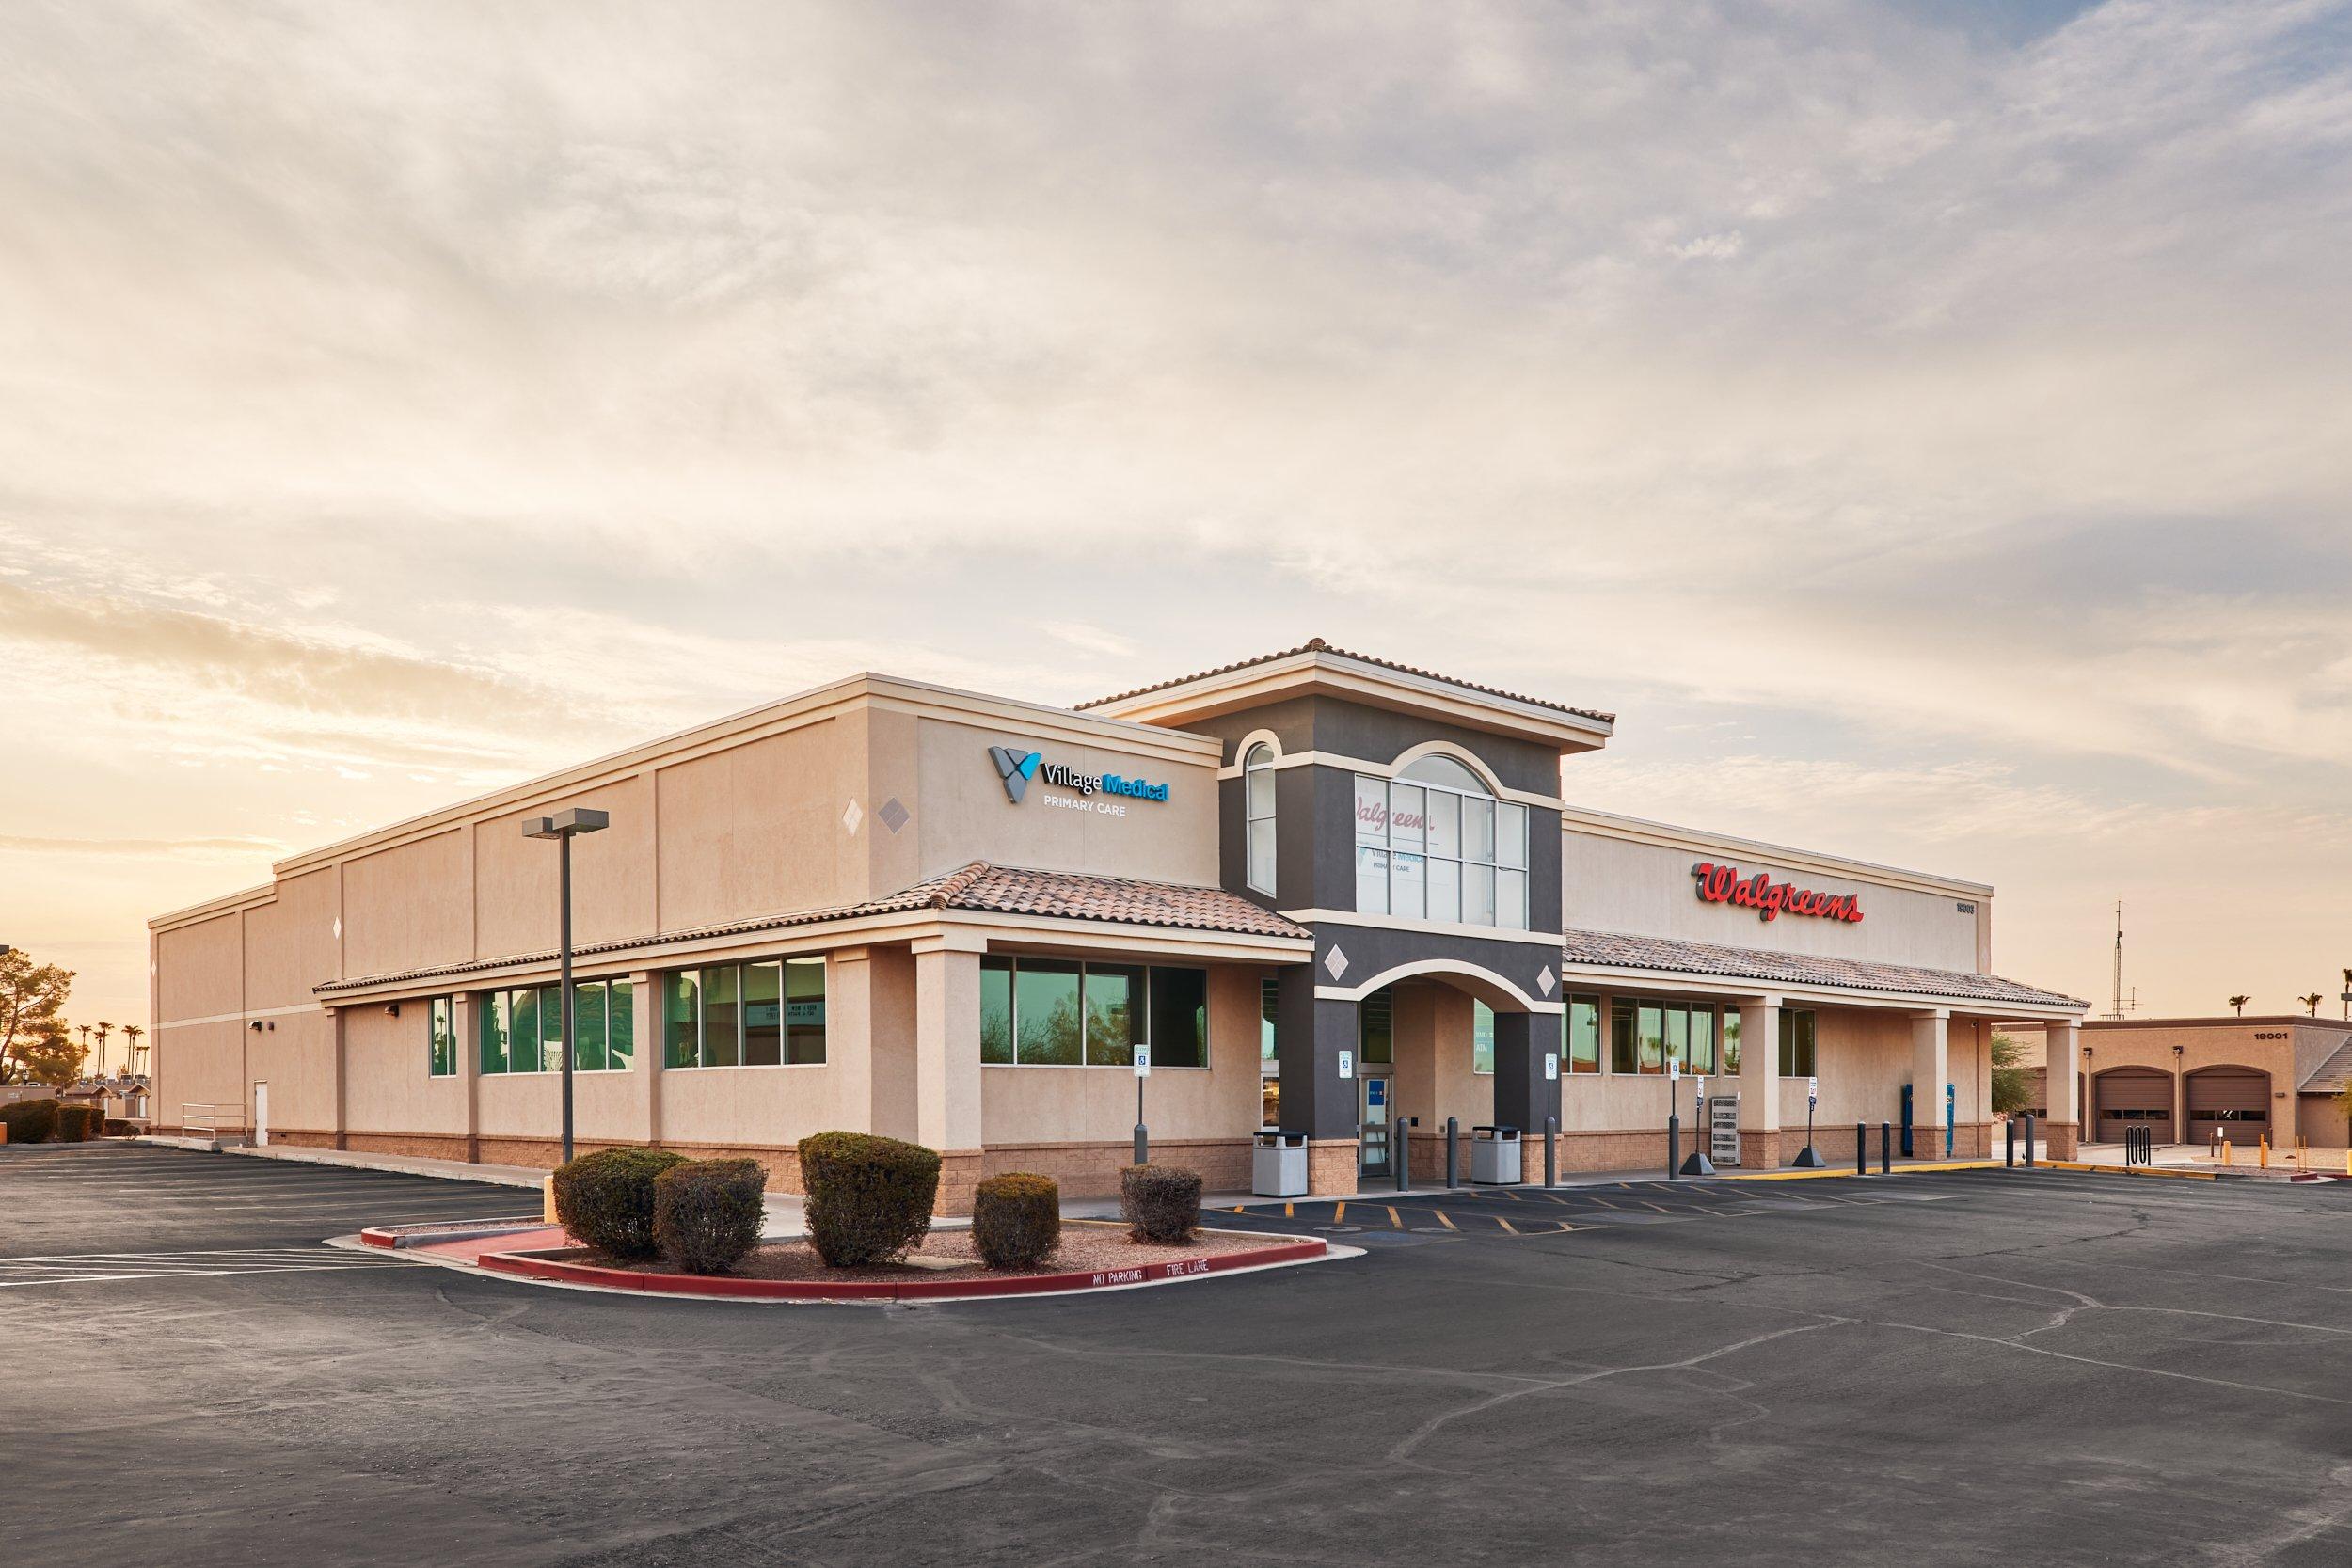 Village Medical at Walgreens - 19003 N RH Johnson Blvd Suite 102 Sun City West, AZ 85375